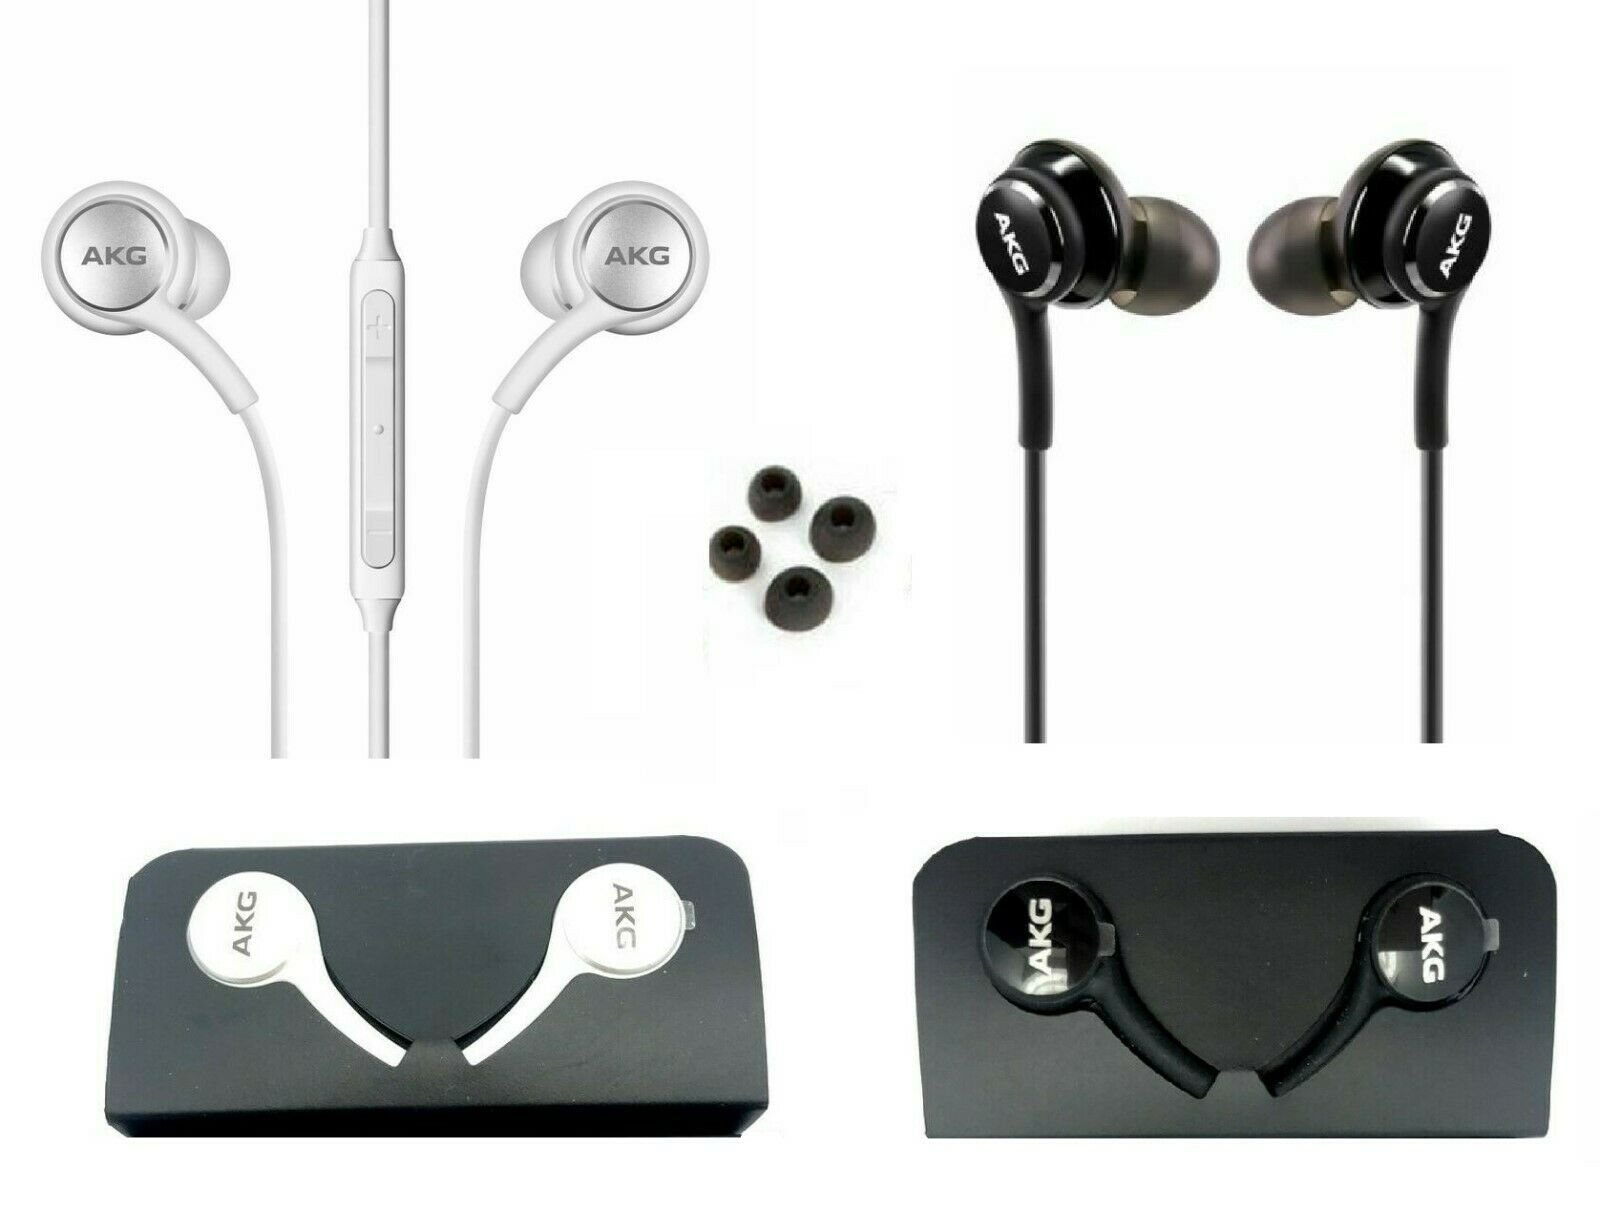 Samsung Galaxy S10 Plus S10e AKG Headphones Earbuds OEM EO-I